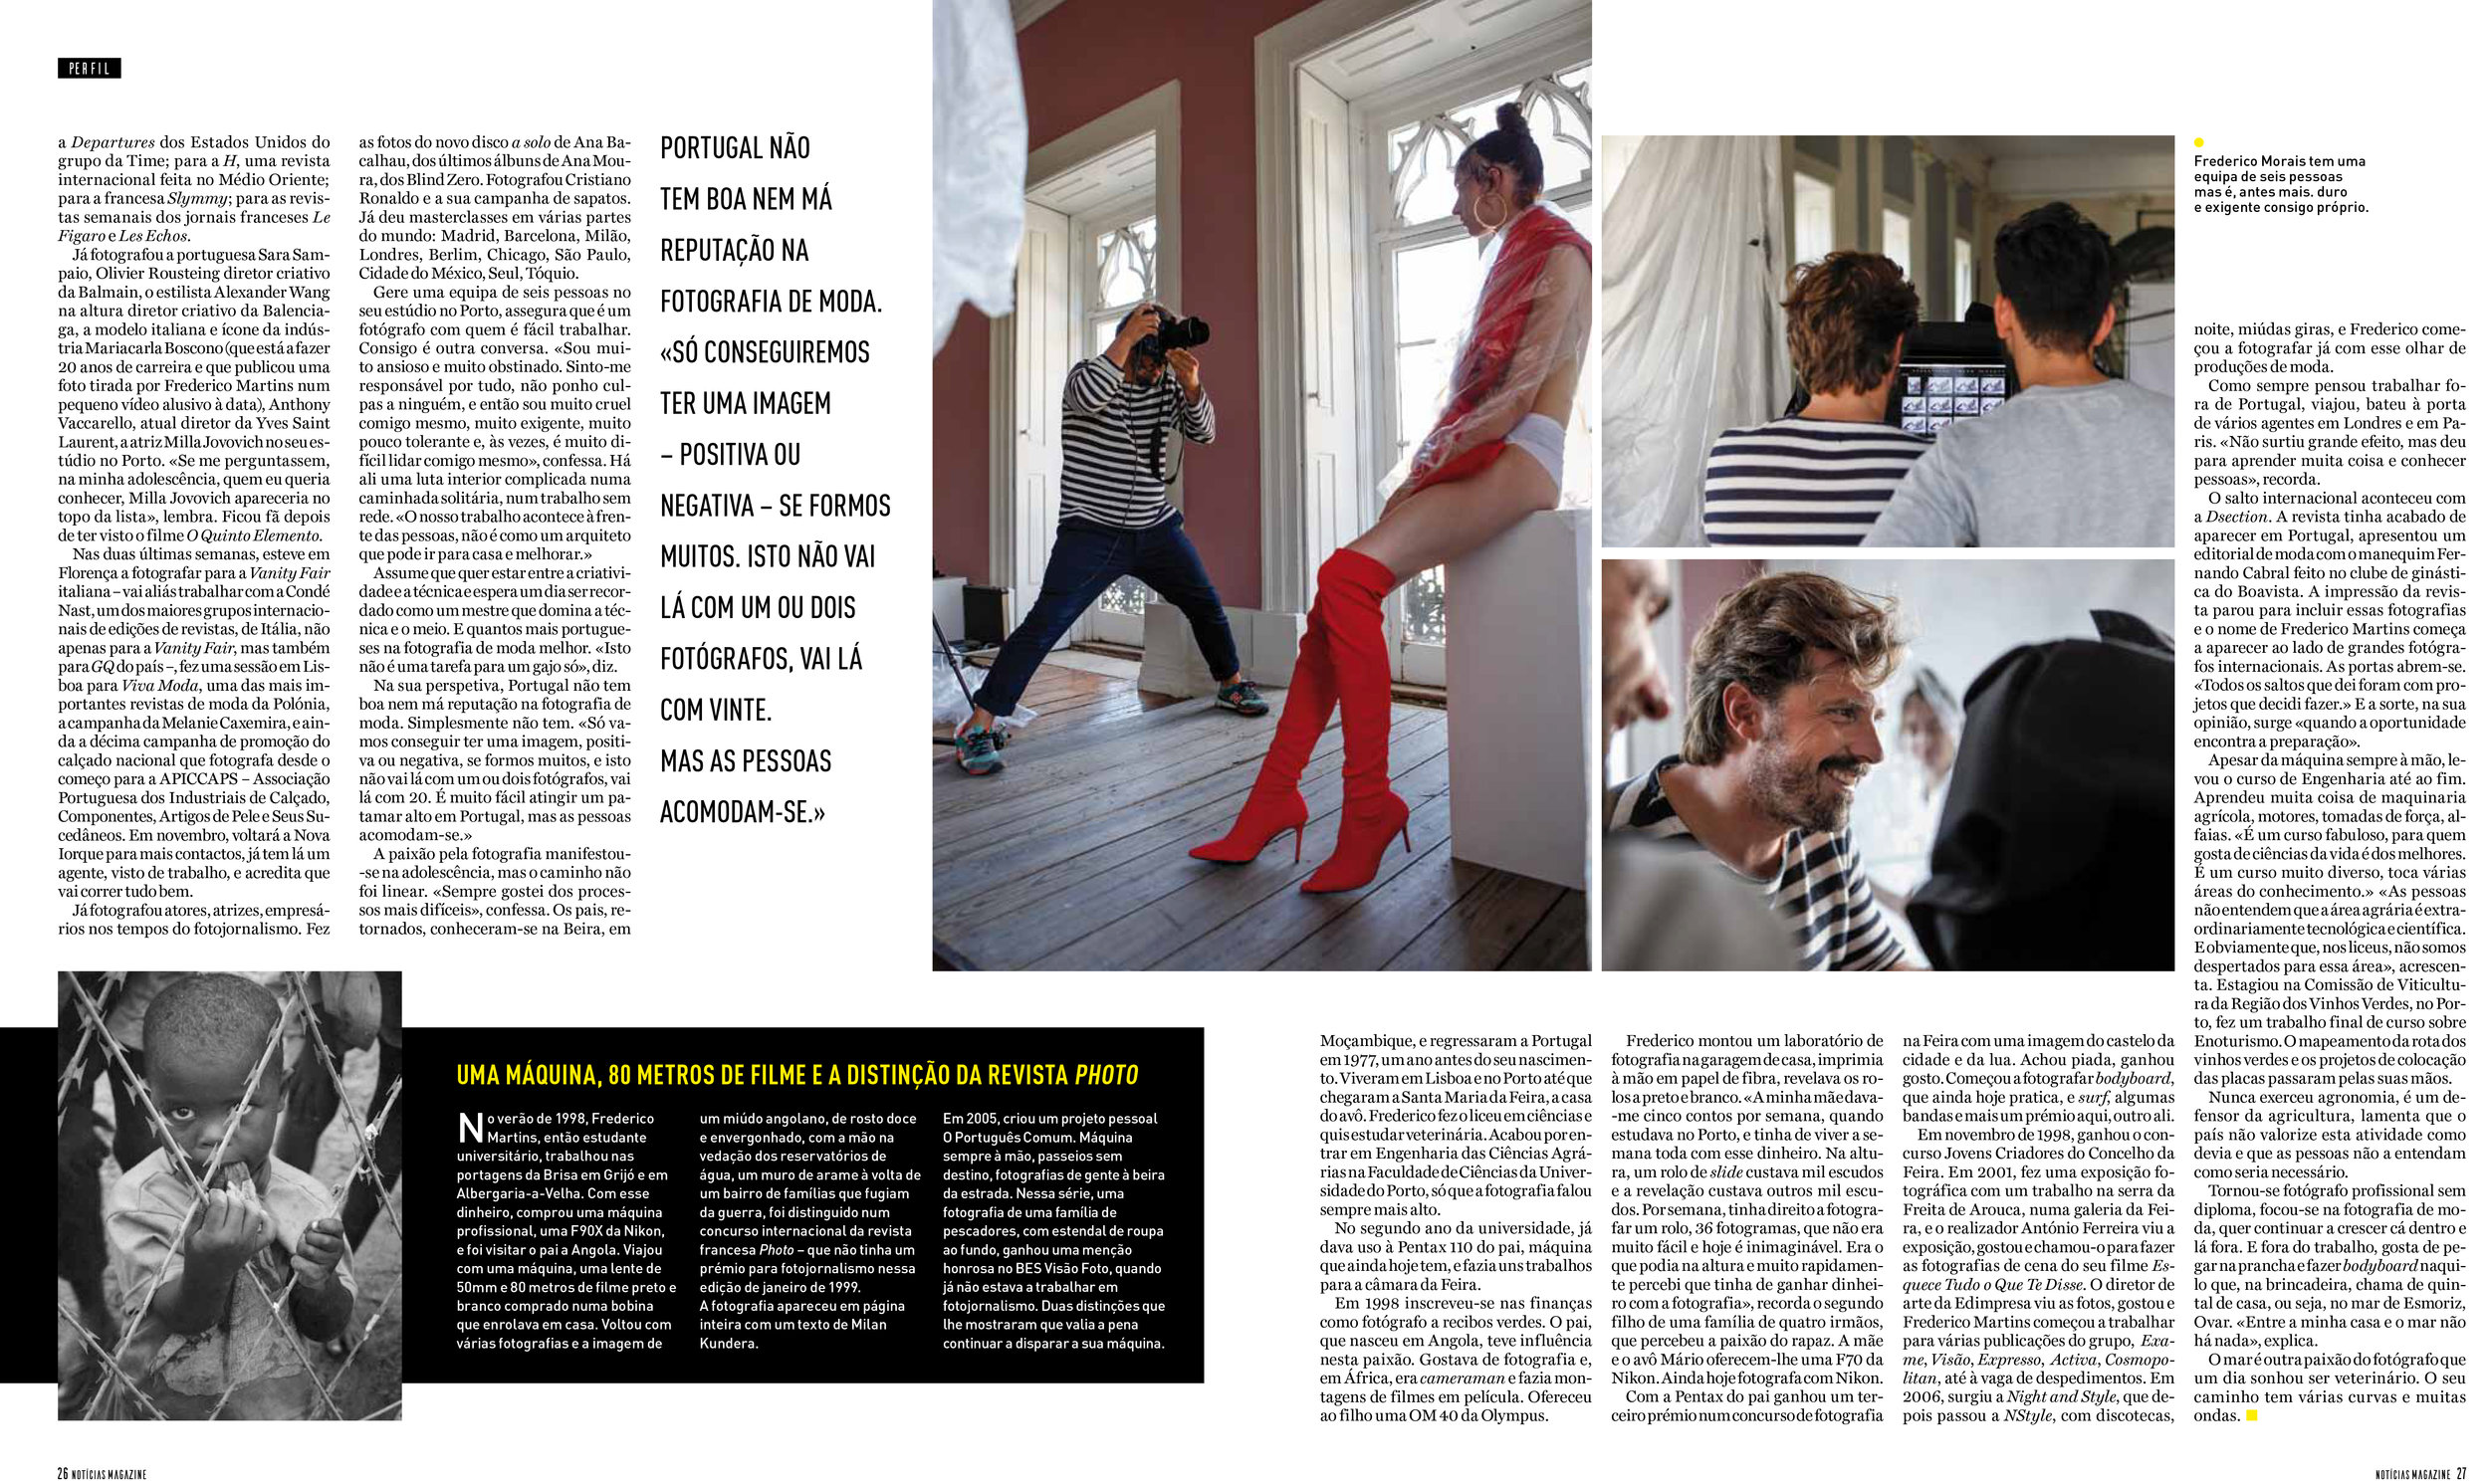 Entrevista_Noticias Magazine_Frederico_3.jpg